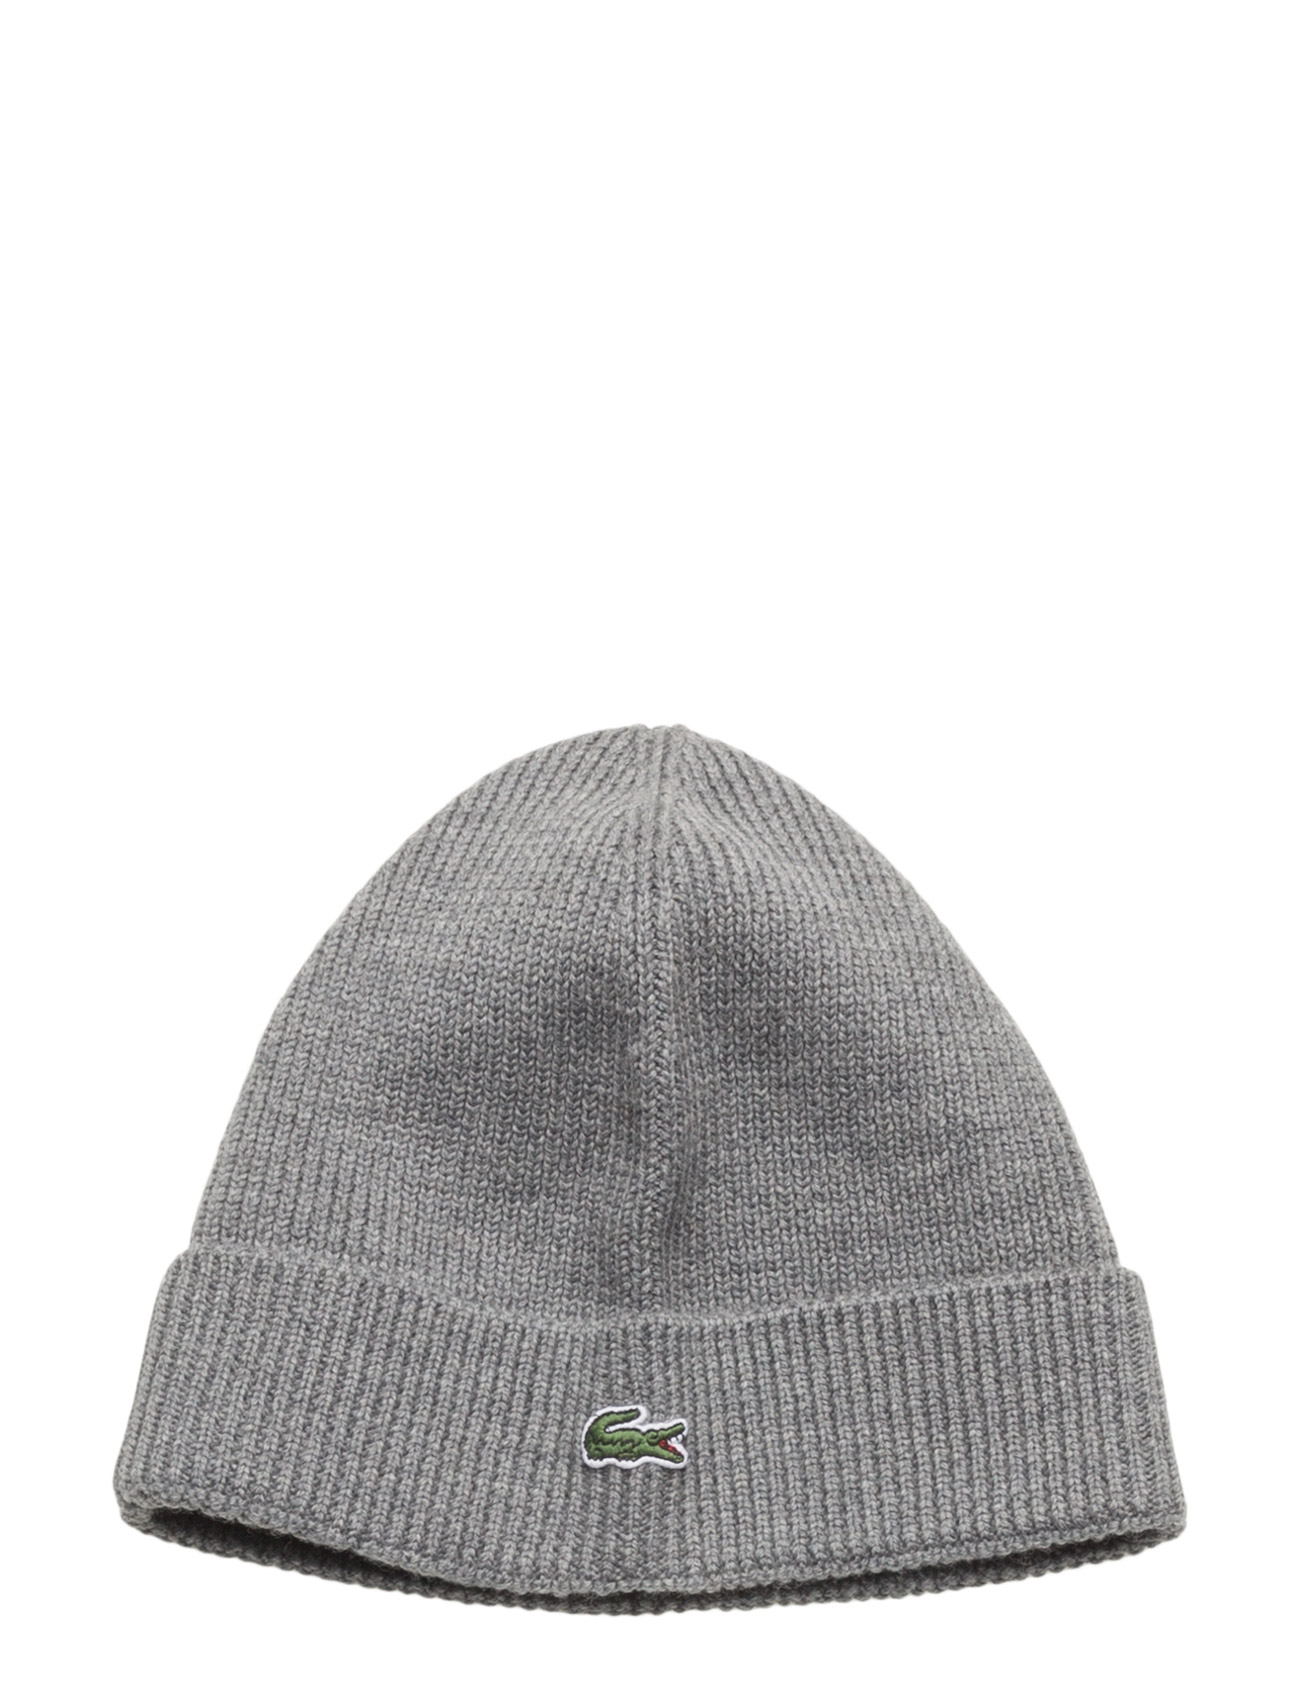 Knitted Caps Lacoste Hatte & Caps til Herrer i